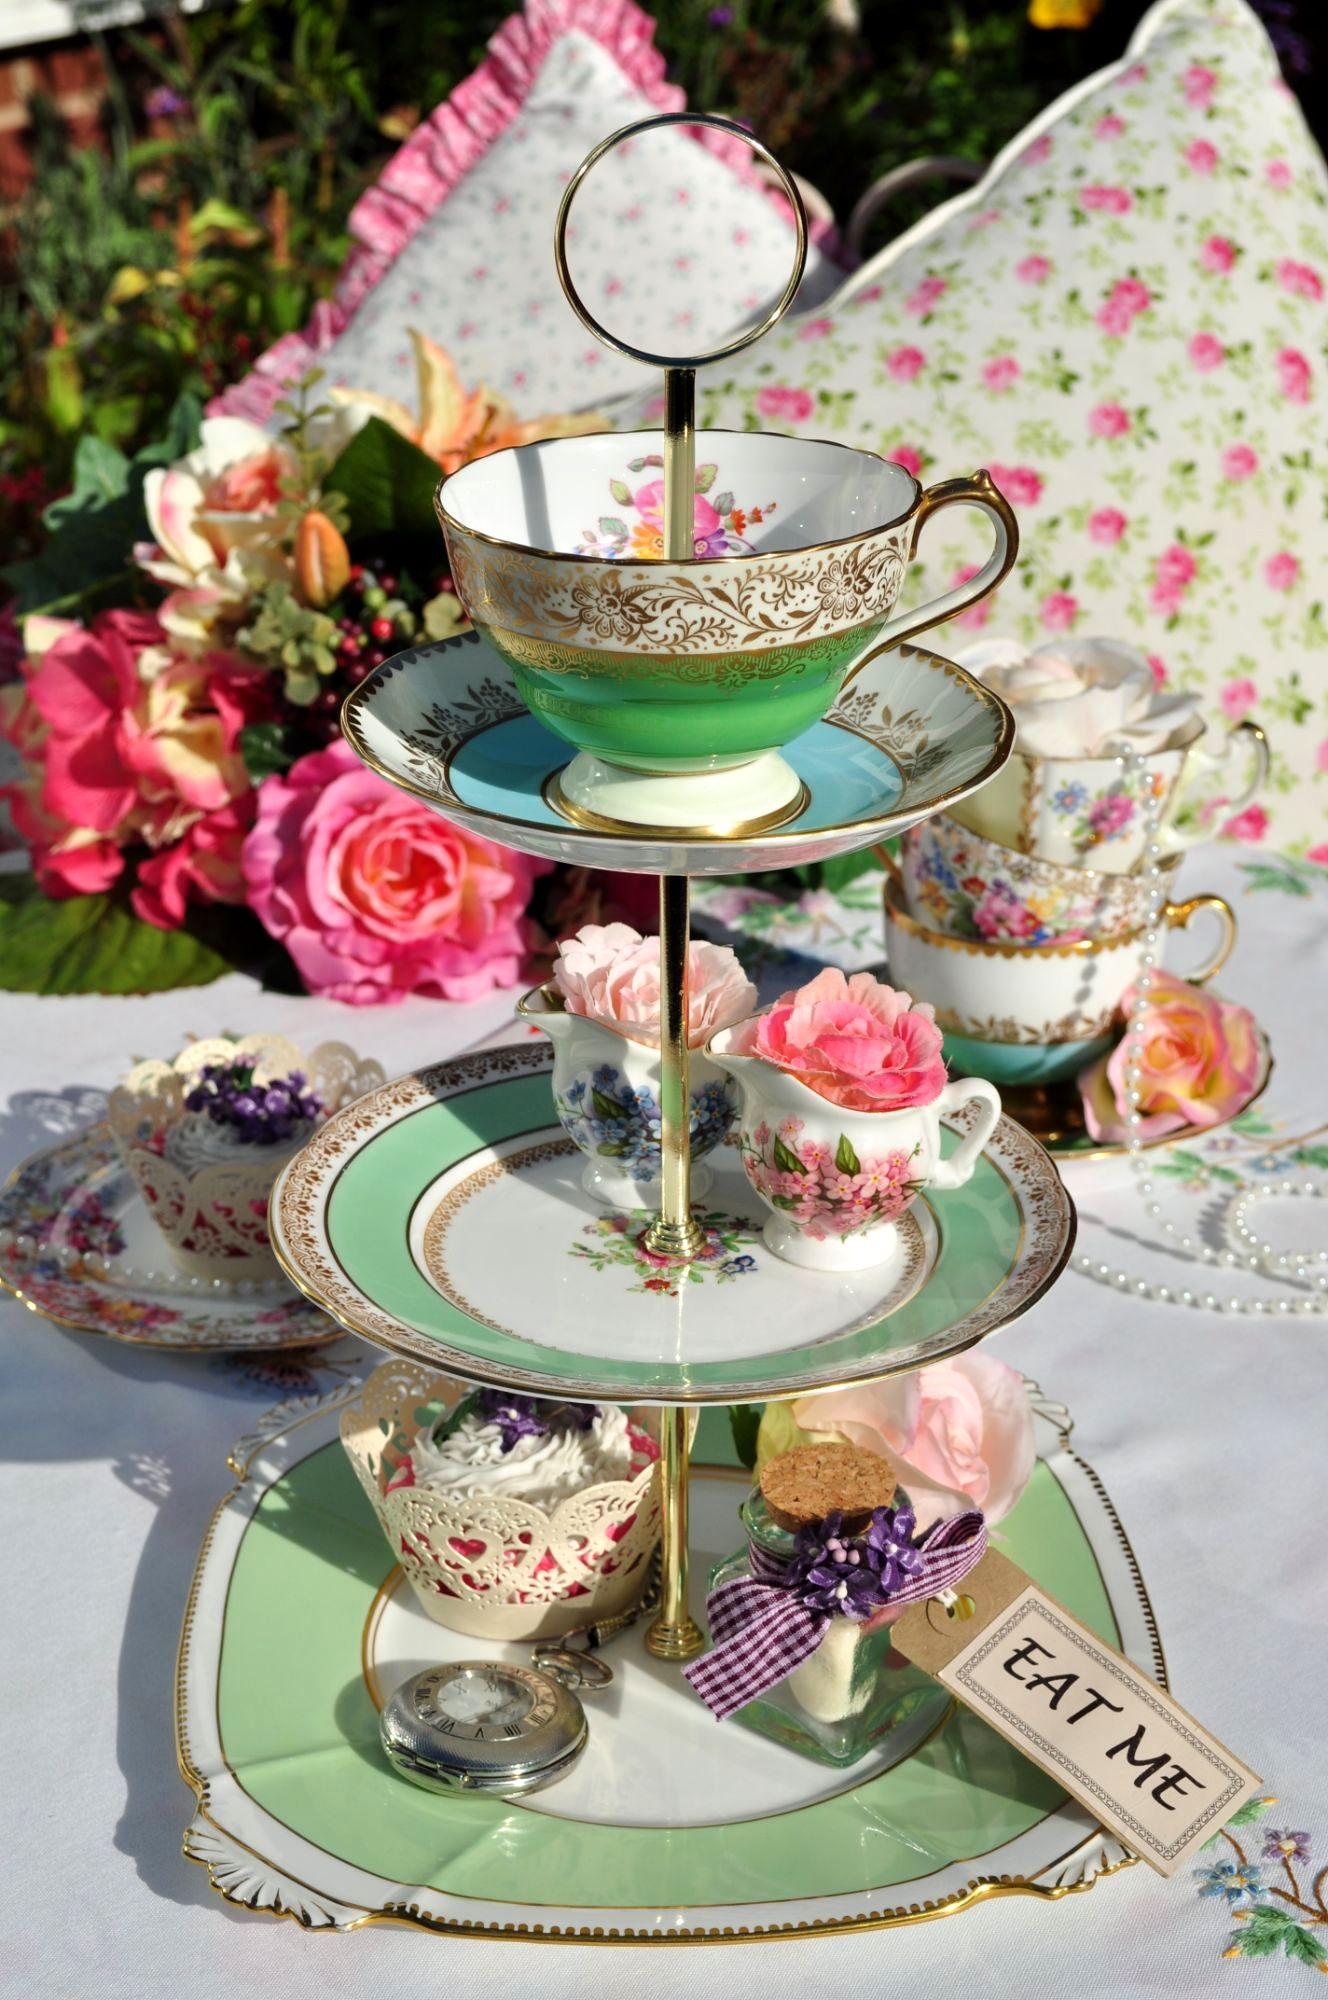 Teacup Top Cake Stand